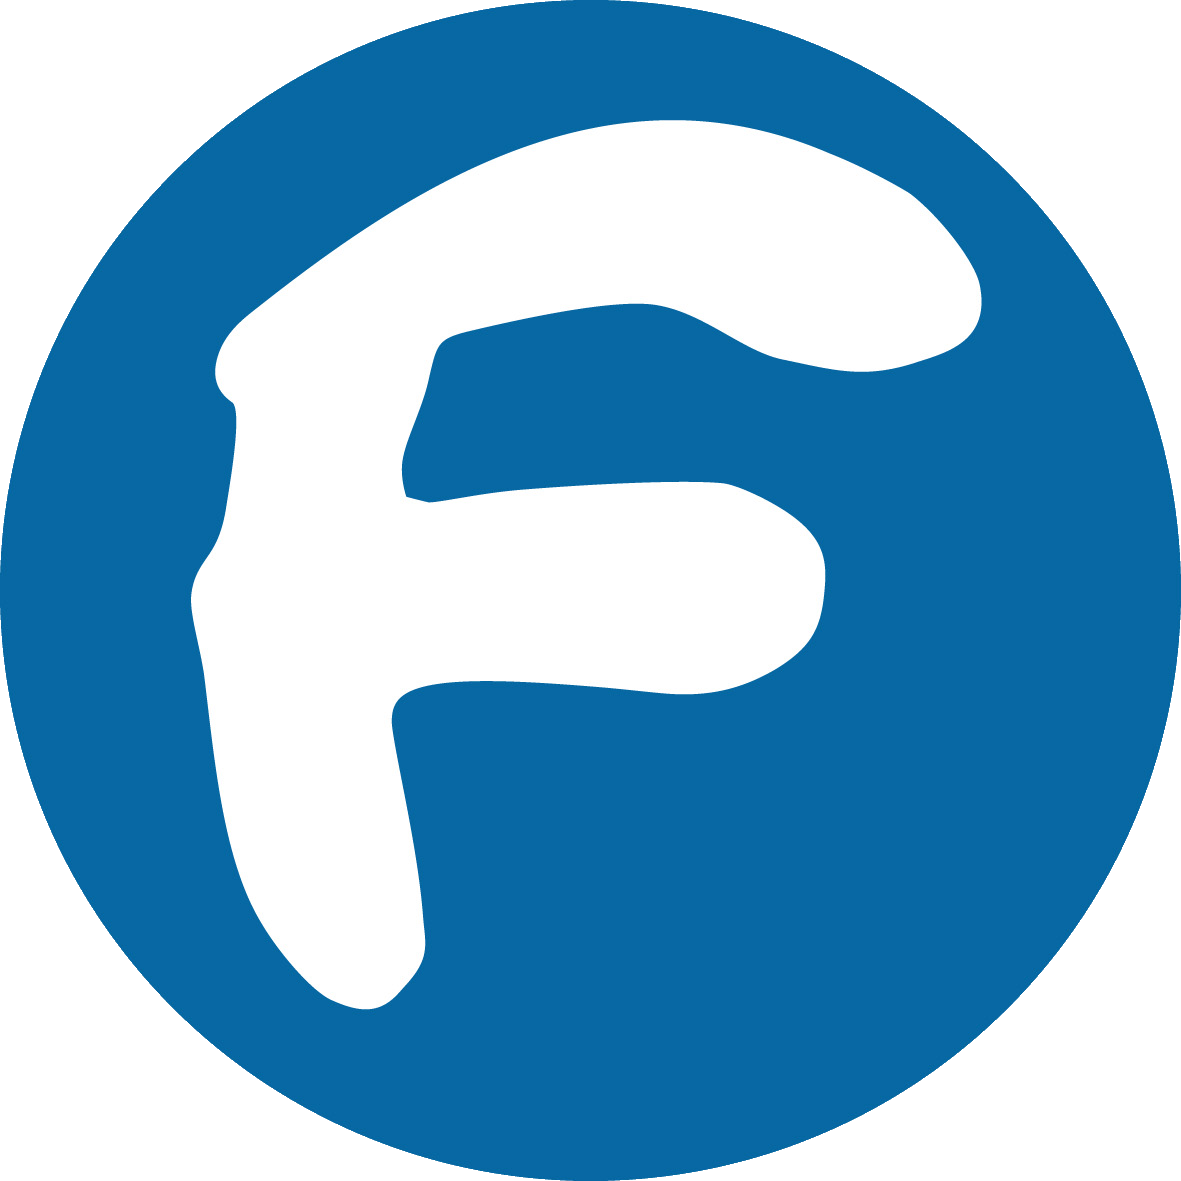 Logo RheinFit Sportakademie GmbH   FERIENFUSSBALL